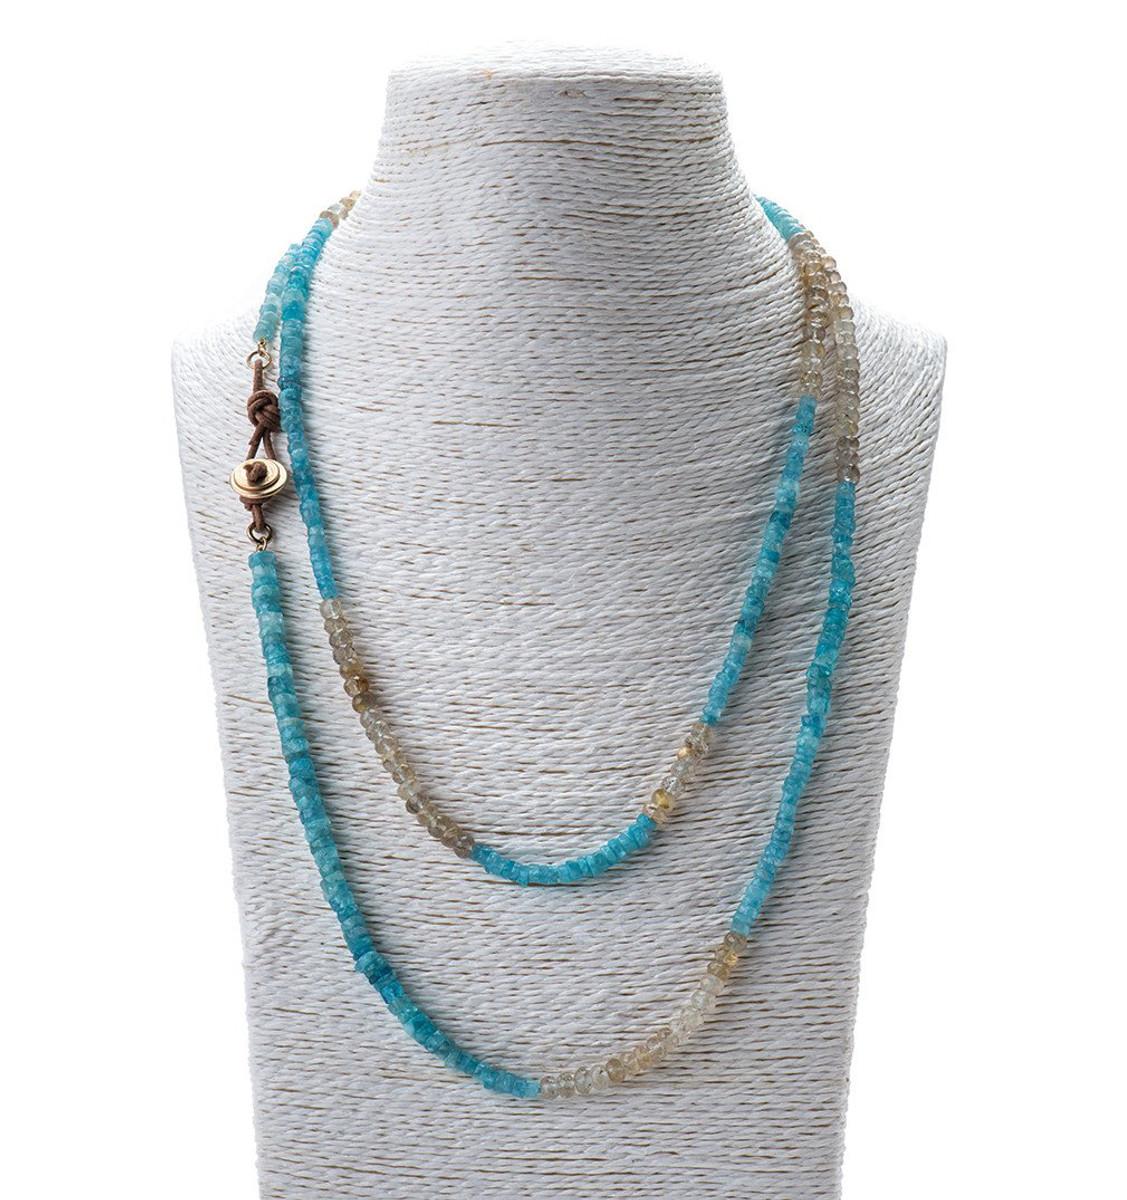 Button Me Up Necklace by the designer Nava Zahavi - New Arrival